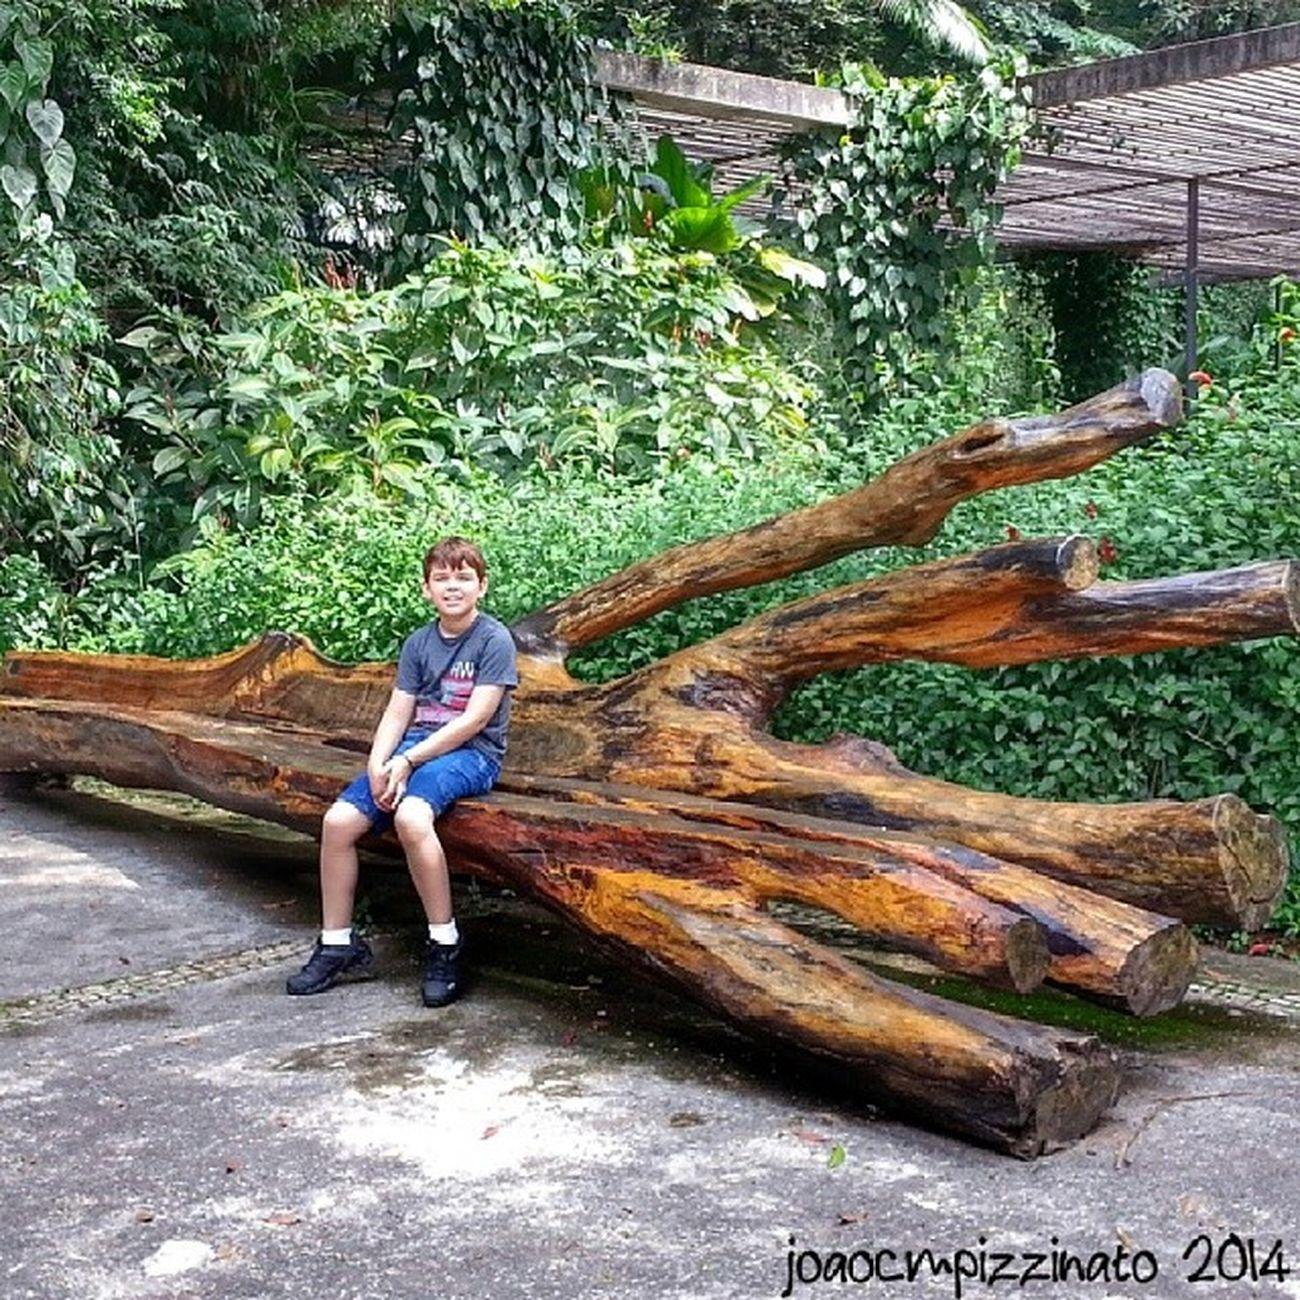 Passeio no Parque. Son Family Tree Plants nature colors city zonasul saopaulo brasil photography burlemarx